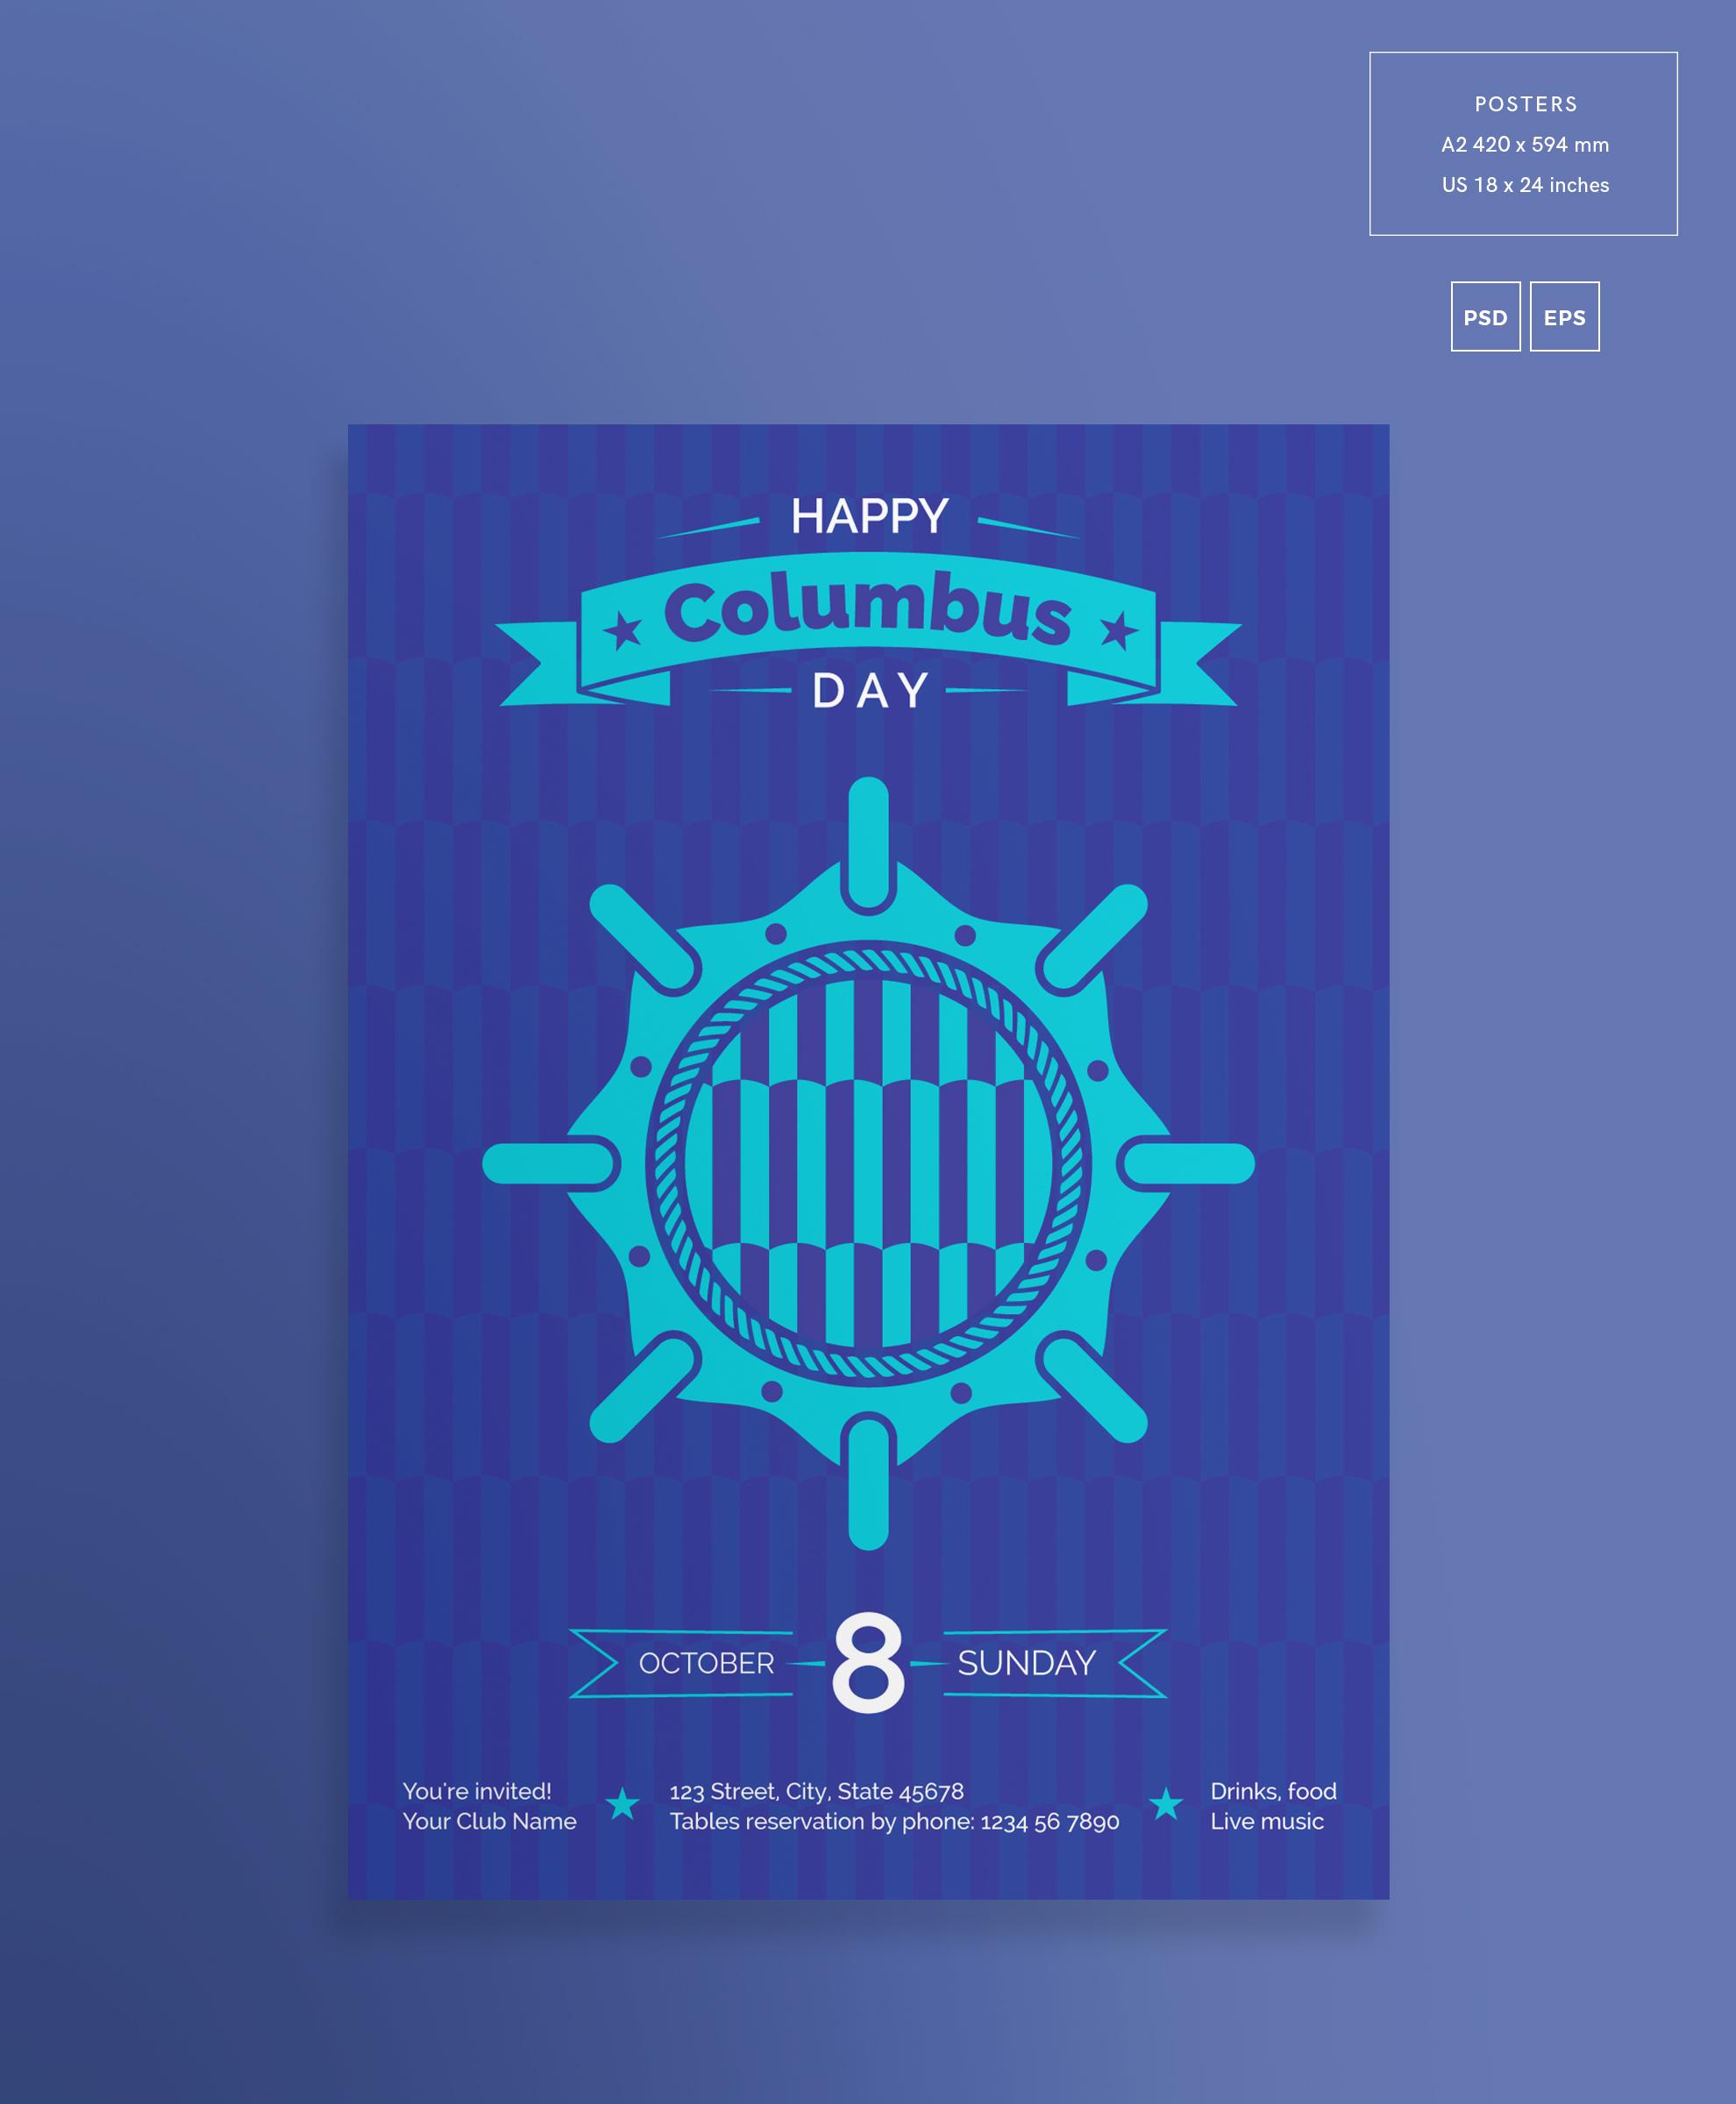 Columbus Day Party Design Templates Bundle example image 3